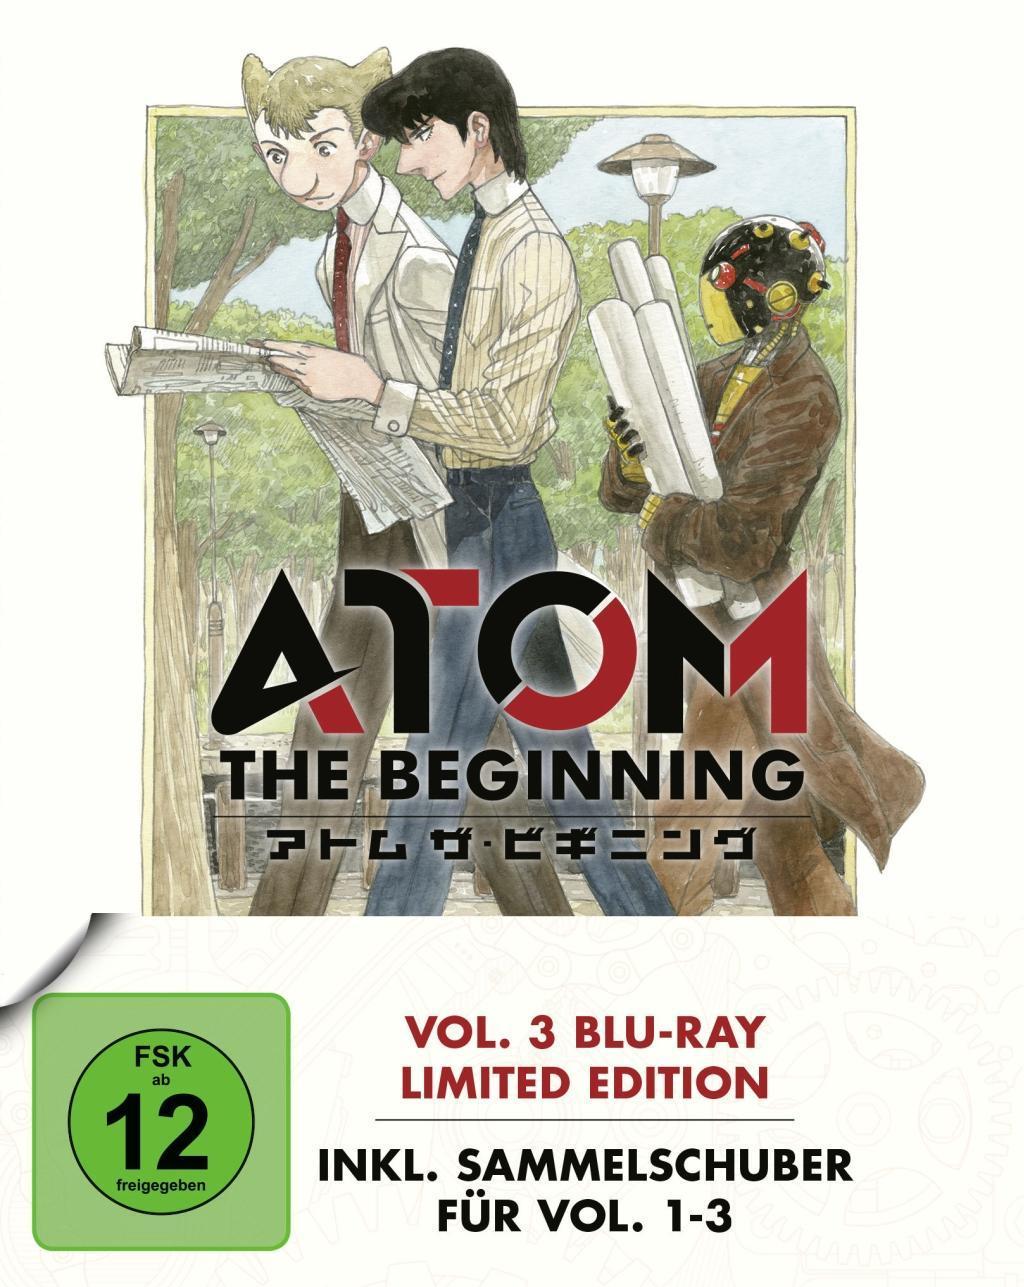 Atom the Beginning  Vol. 3 / inkl. Sammelschuber  Junichi Fujisaku  Blu-ray Disc  Deutsch  2017